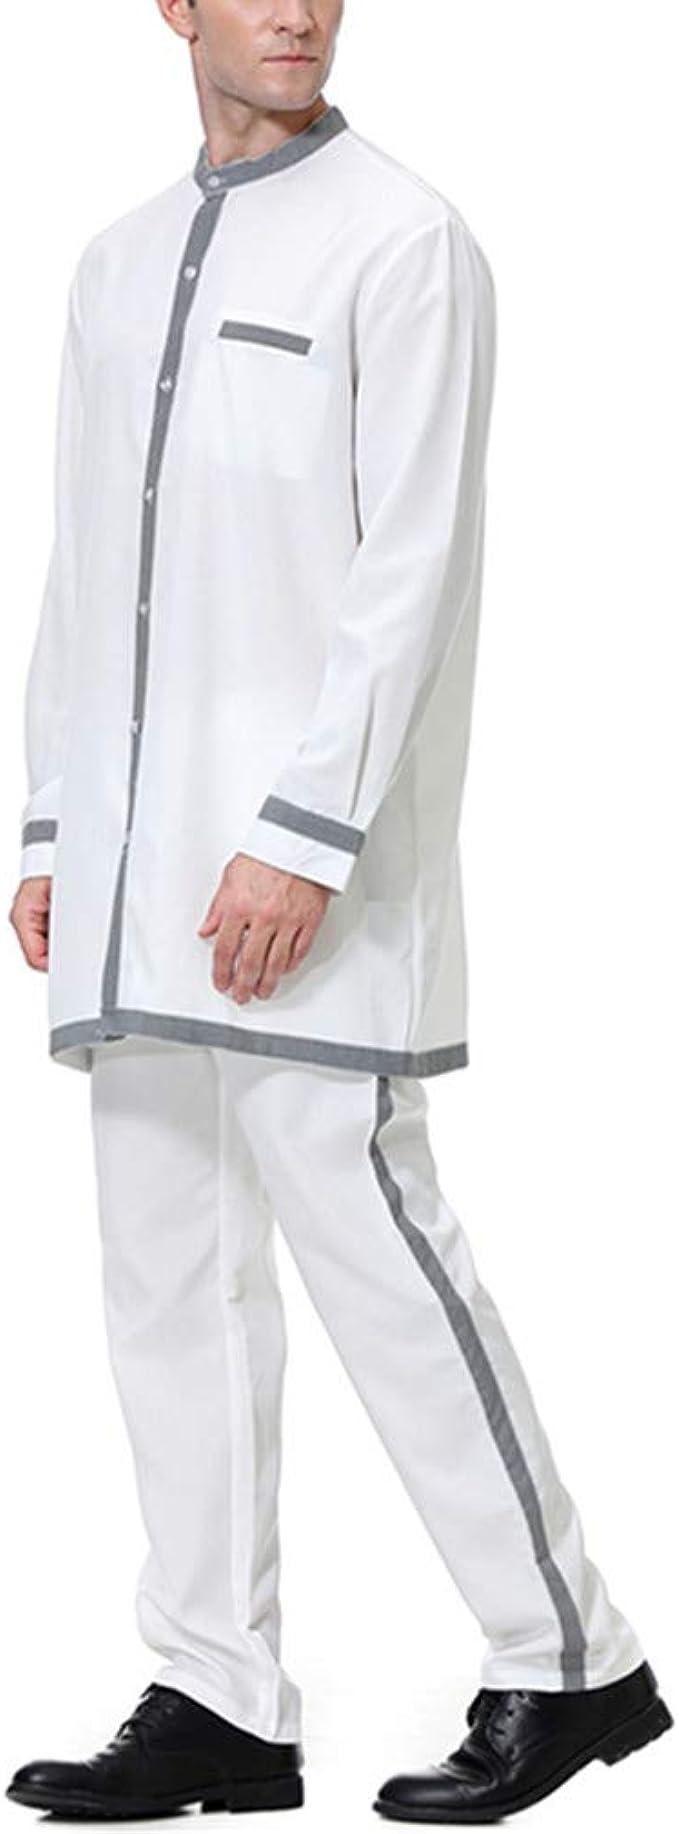 Longue Chemise Costume Abaya Dubai de Soirée Orientale KRUIHAN Robe Homme Arabe Vêtements ...